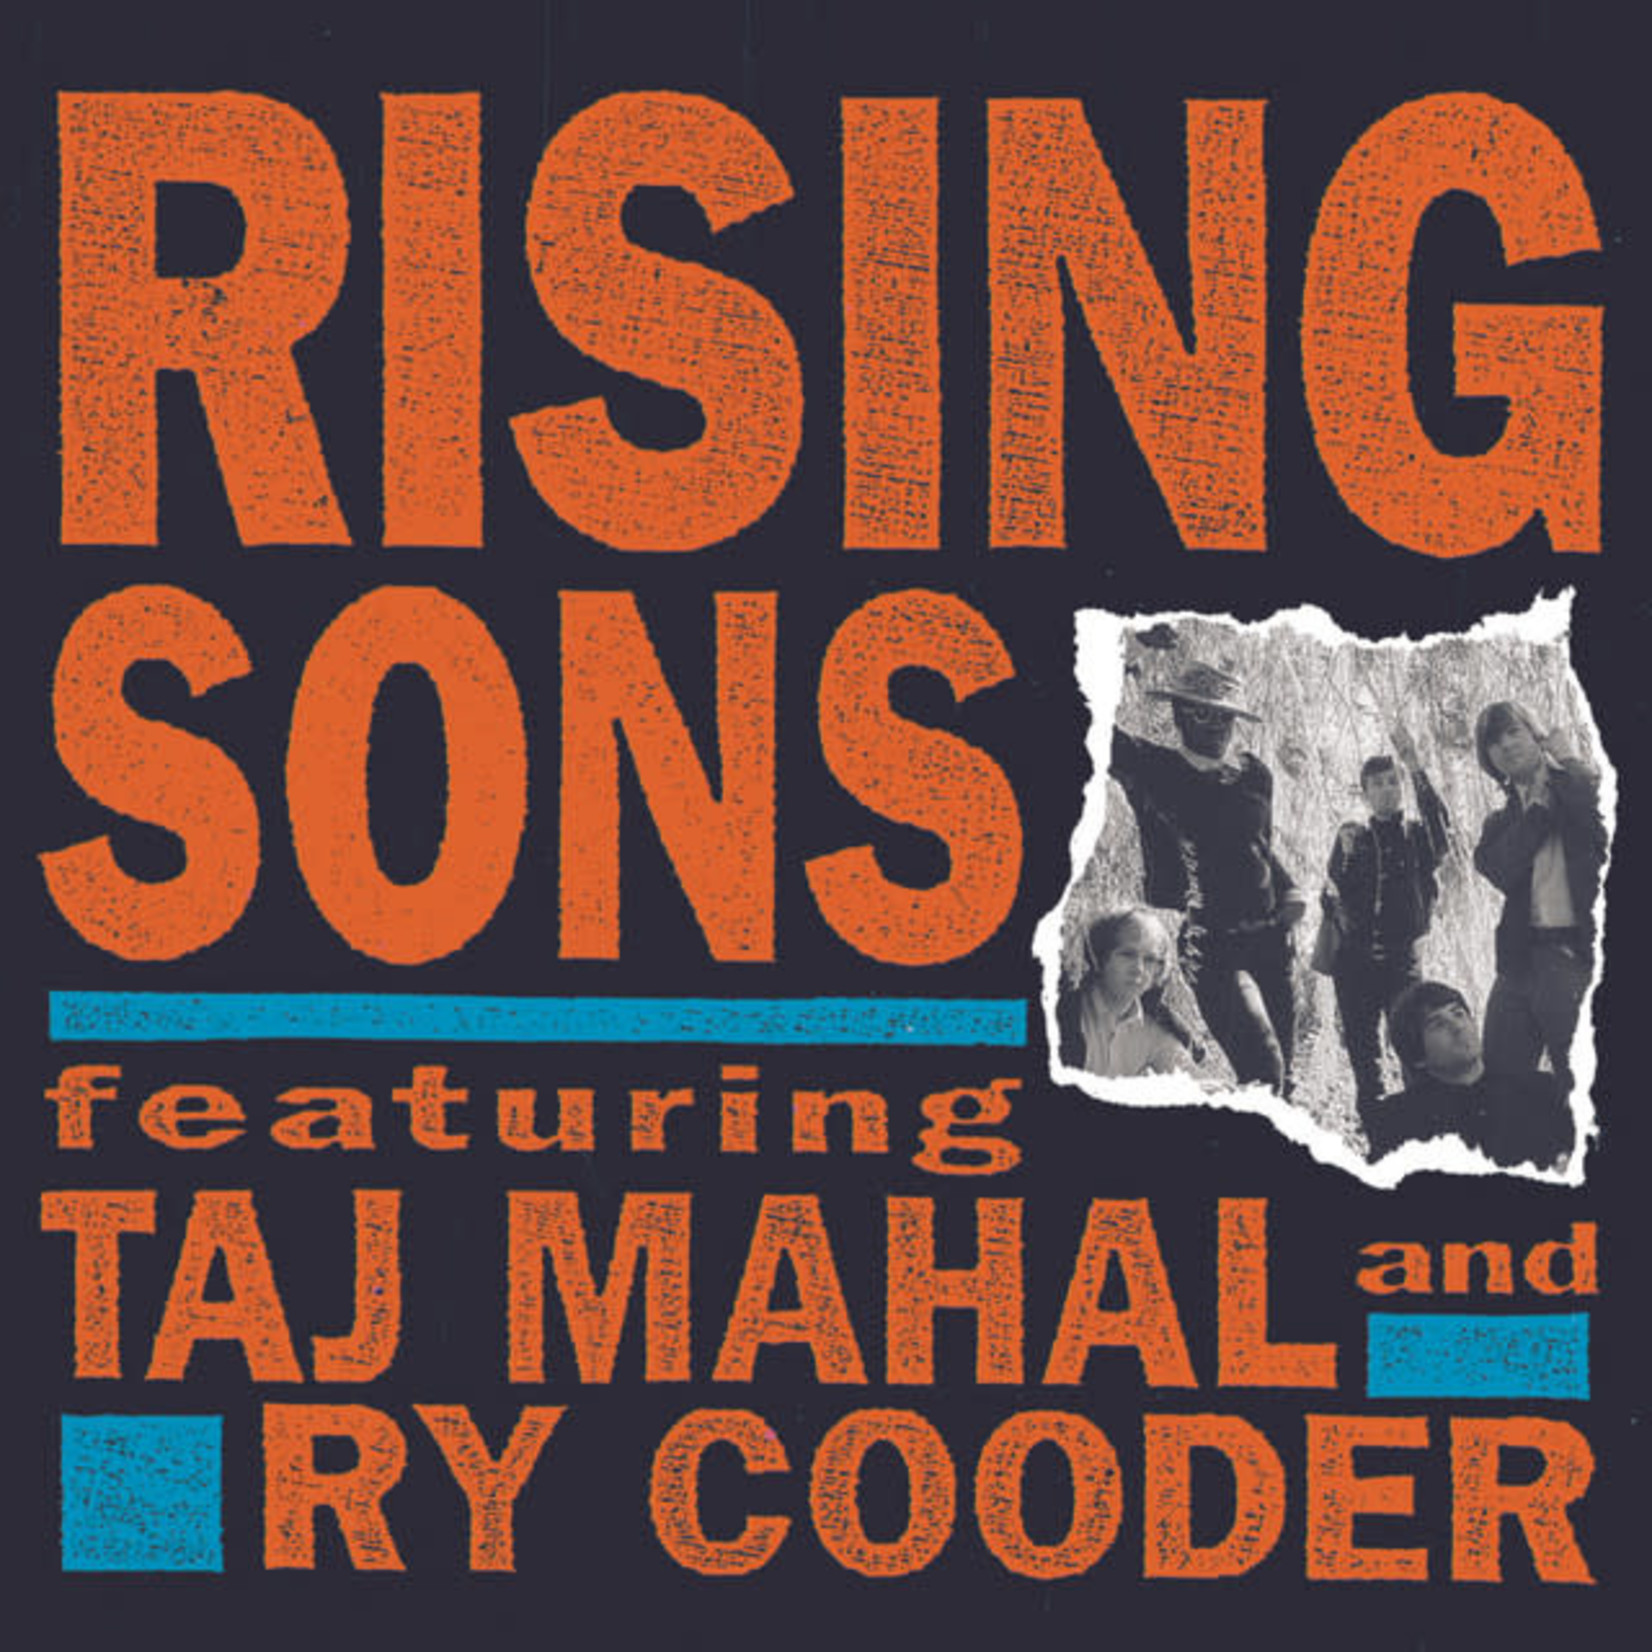 Vinyl Rising Sons - S/T (Featuring Taj Mahal & Ry Cooder)